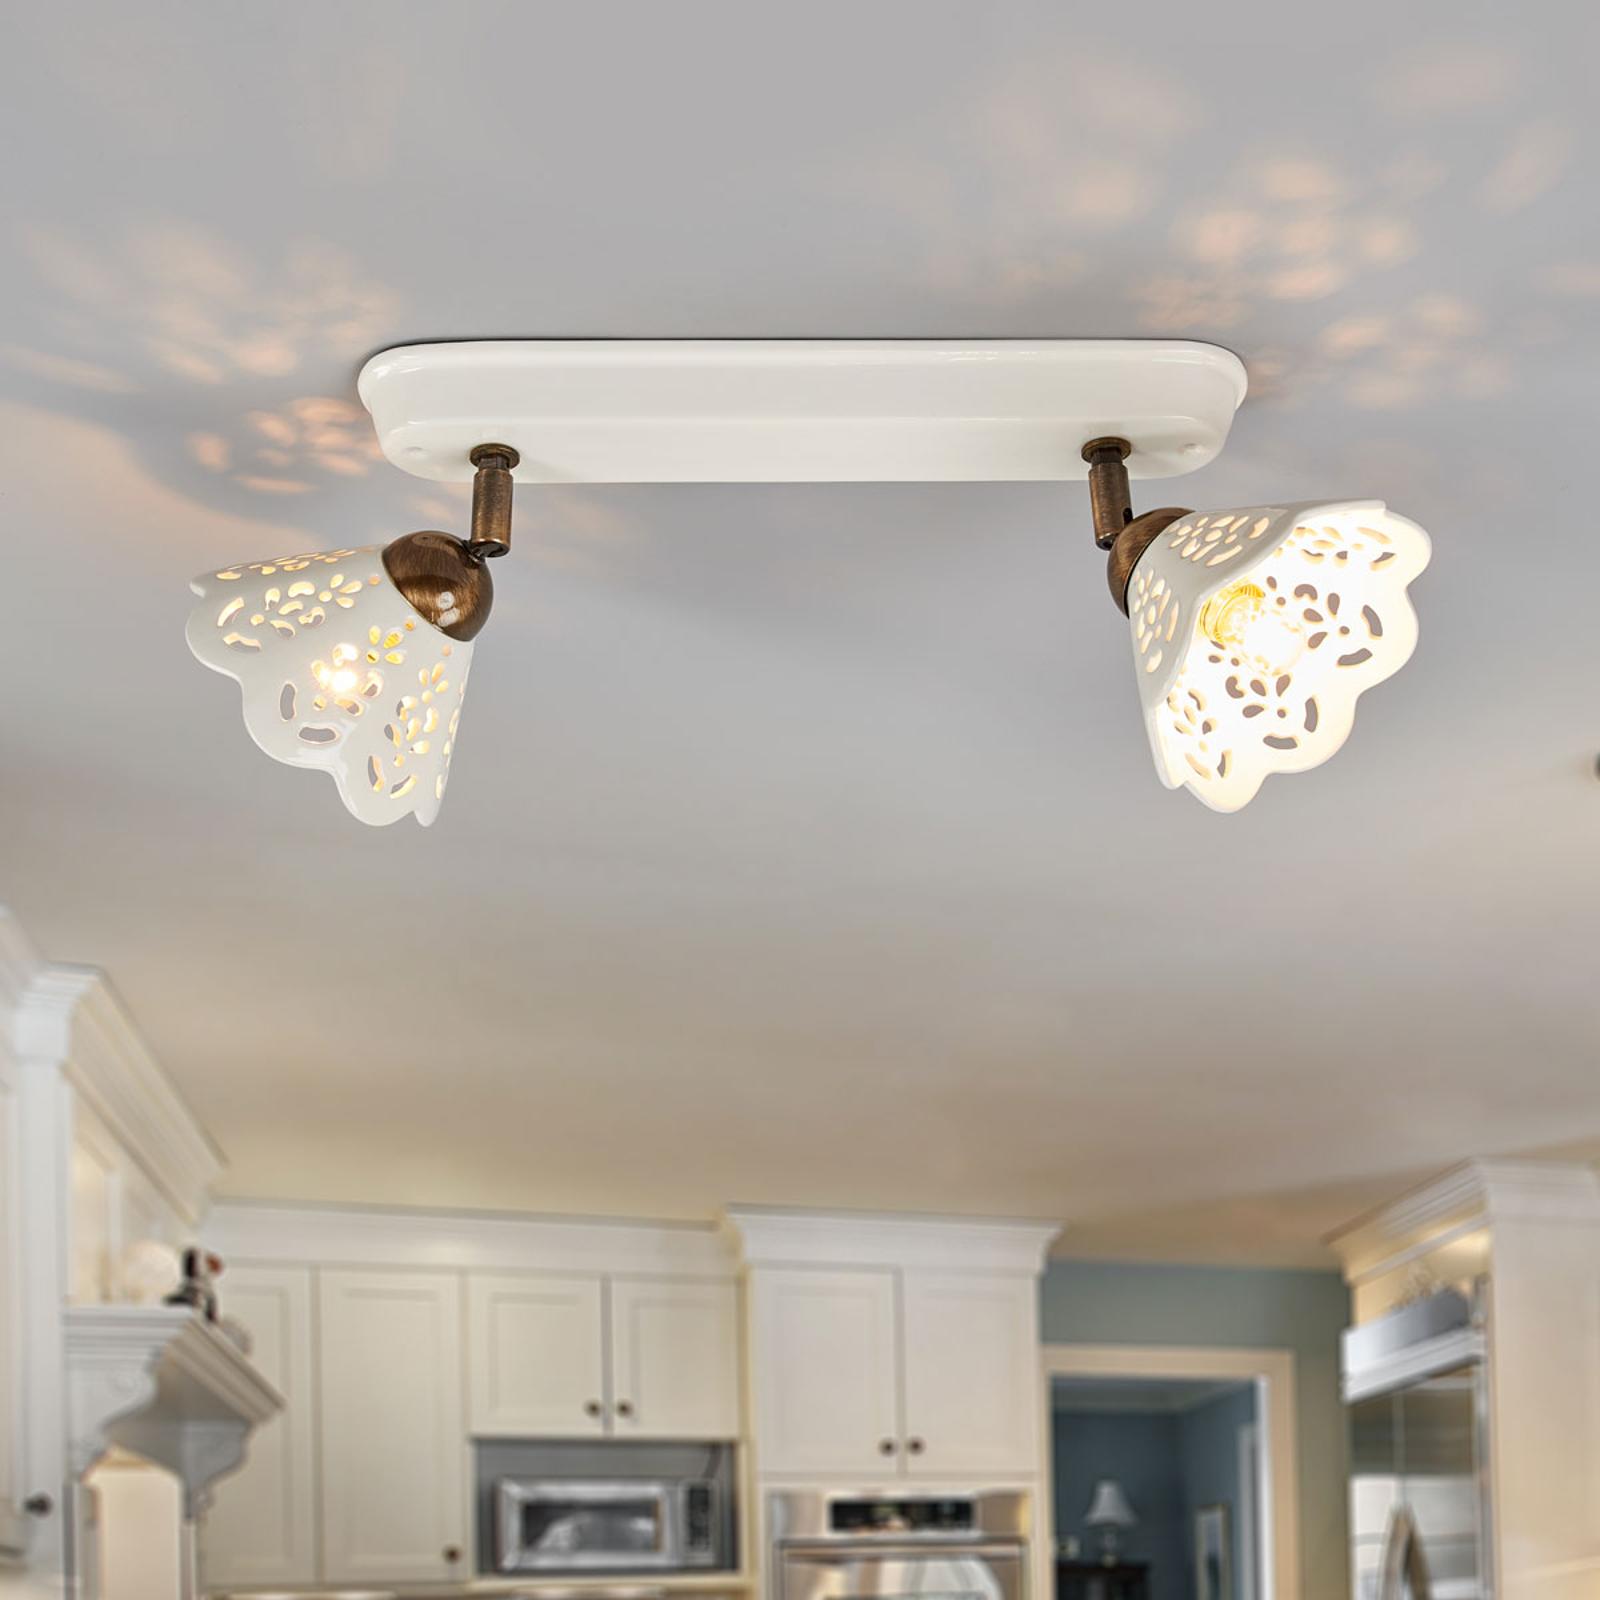 Charming PORTICO wall or ceiling light, 2-bulb_2013055_1